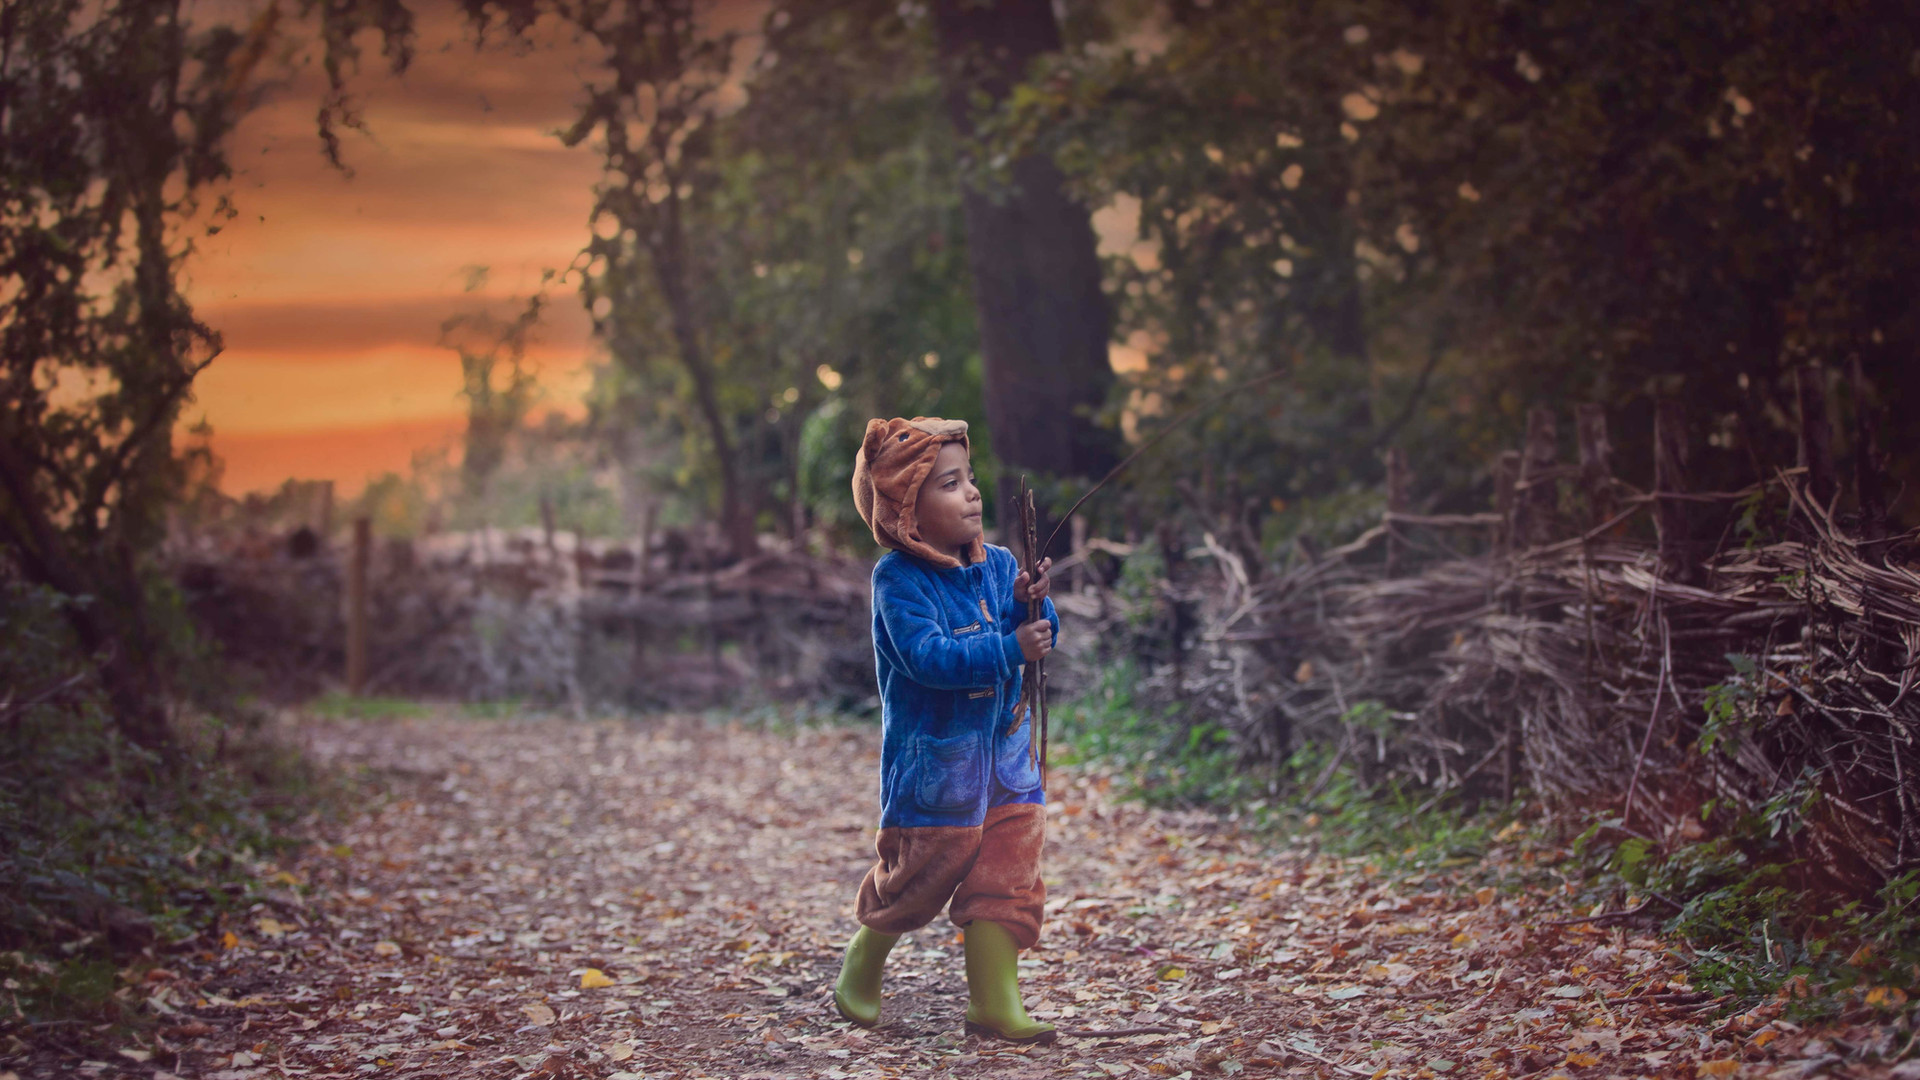 woodlight_photography.jpg